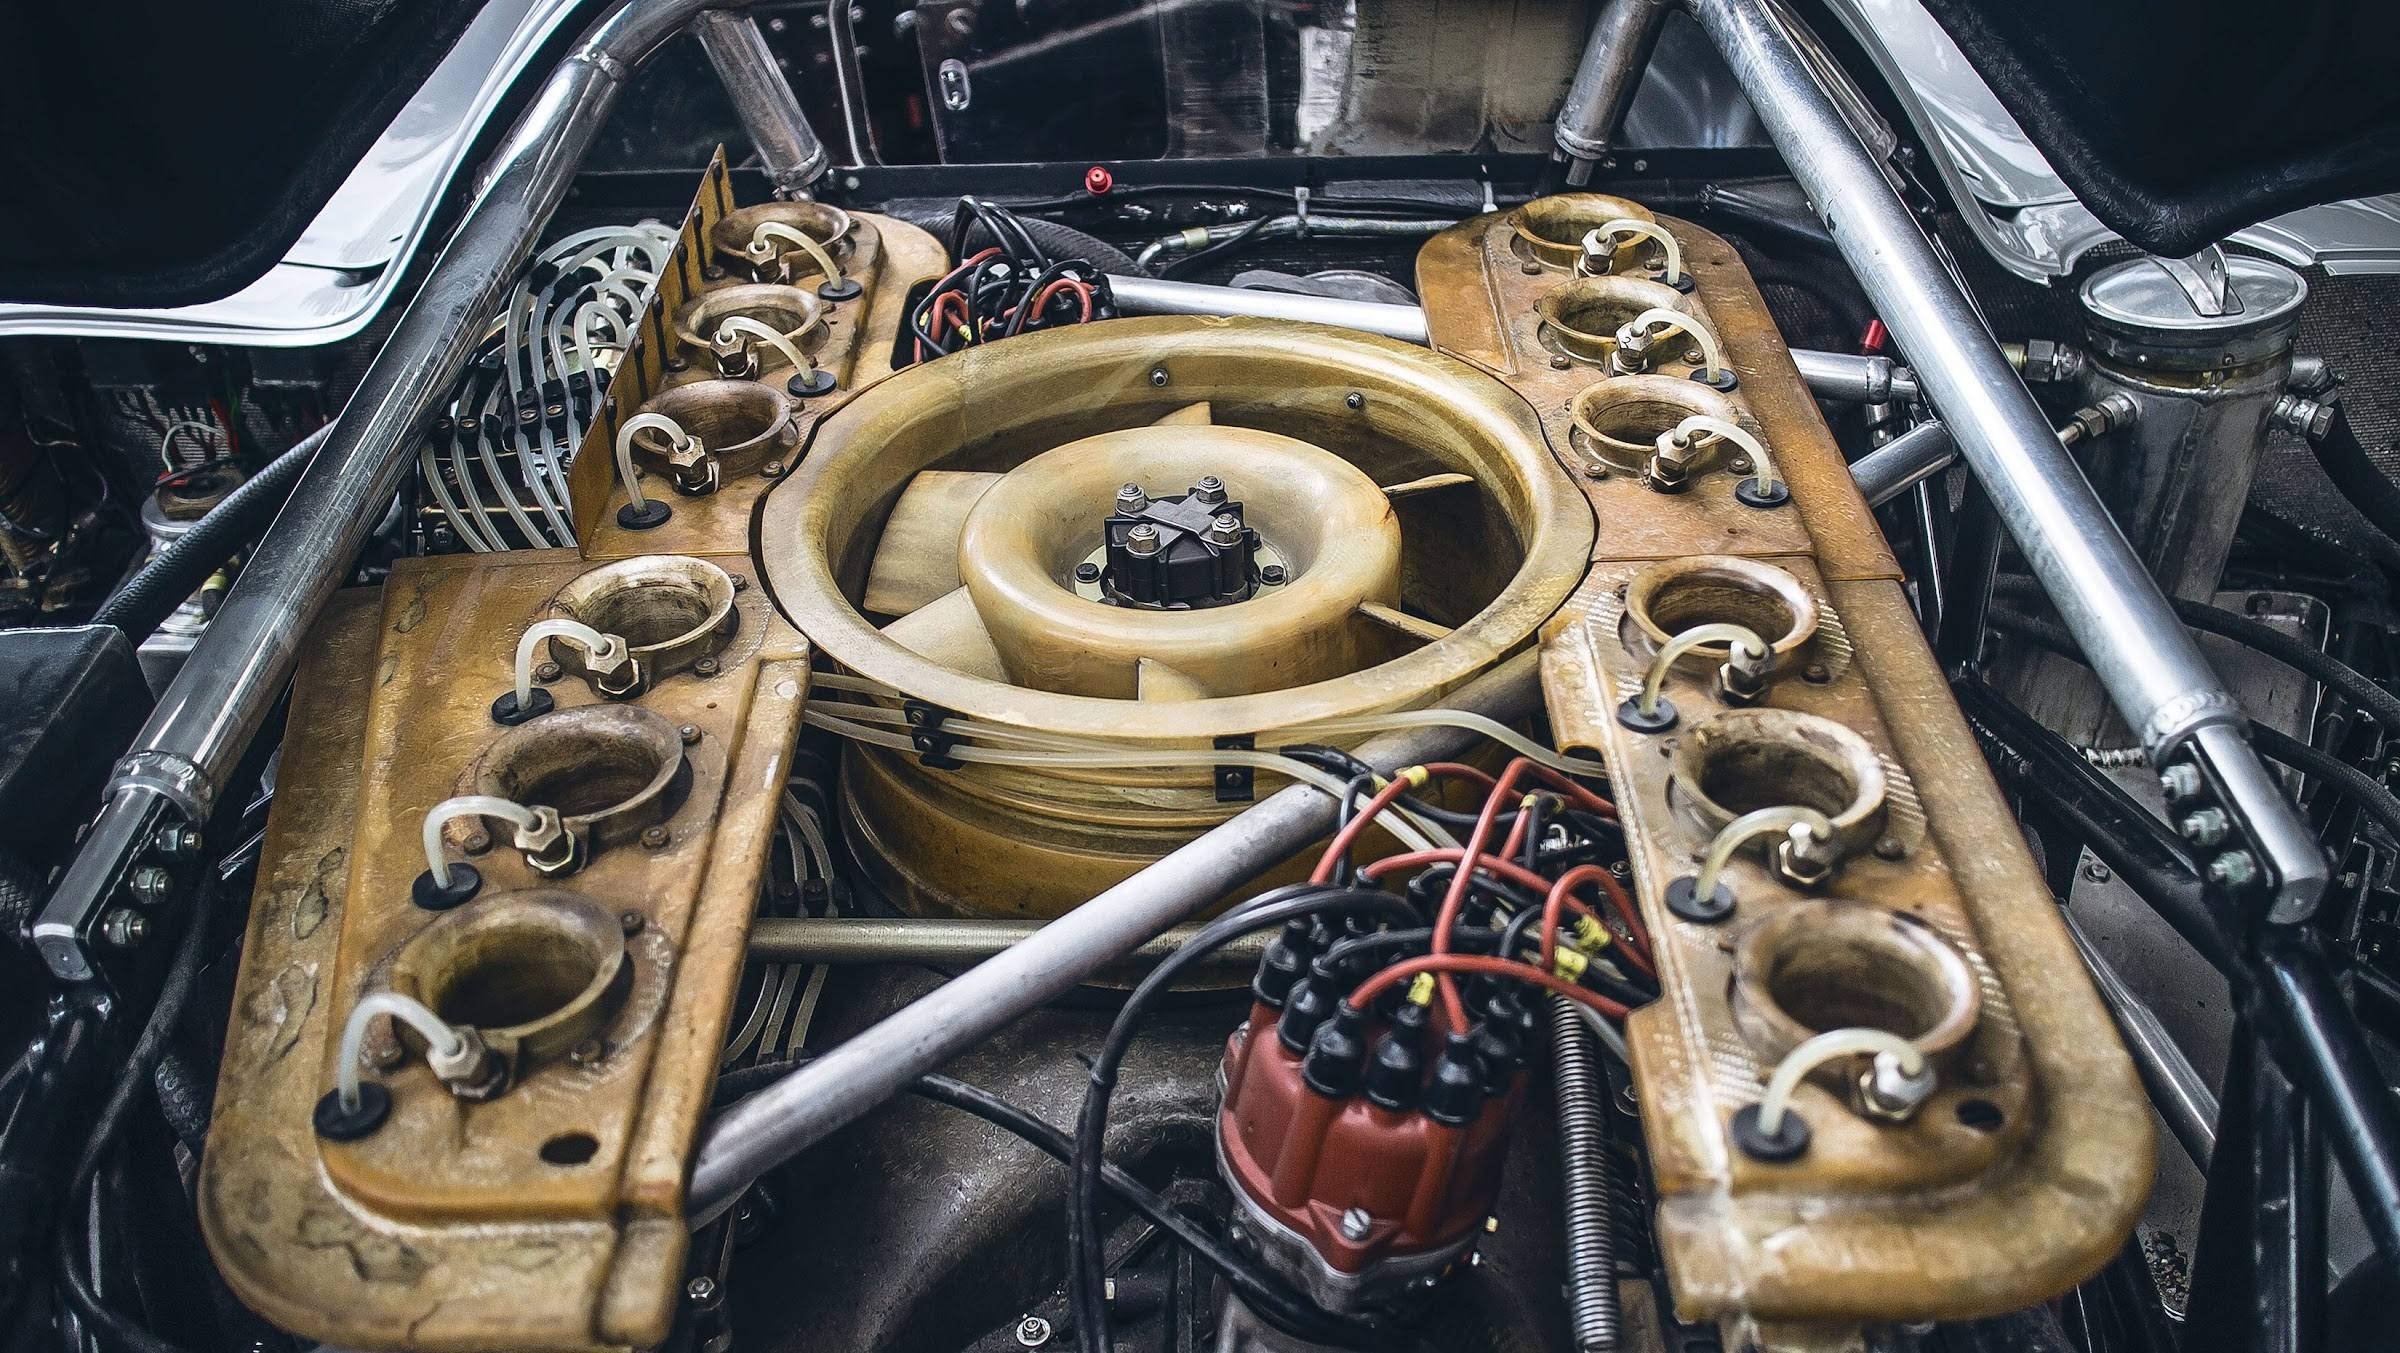 wAA2V0XrMESY vp7zsfuZT3hLDWaR9SyH7yfin9f5nWBNLmz0YWM8XBZrn WSq96RpGBw2ycKKIYmIRxGdSaSJrzW096G82P0o oMlnngDDS6NVpEH27uyplqxevjsUQ d5e8FcQ=w2400 - De Le Mans a la calle: Porsche 917